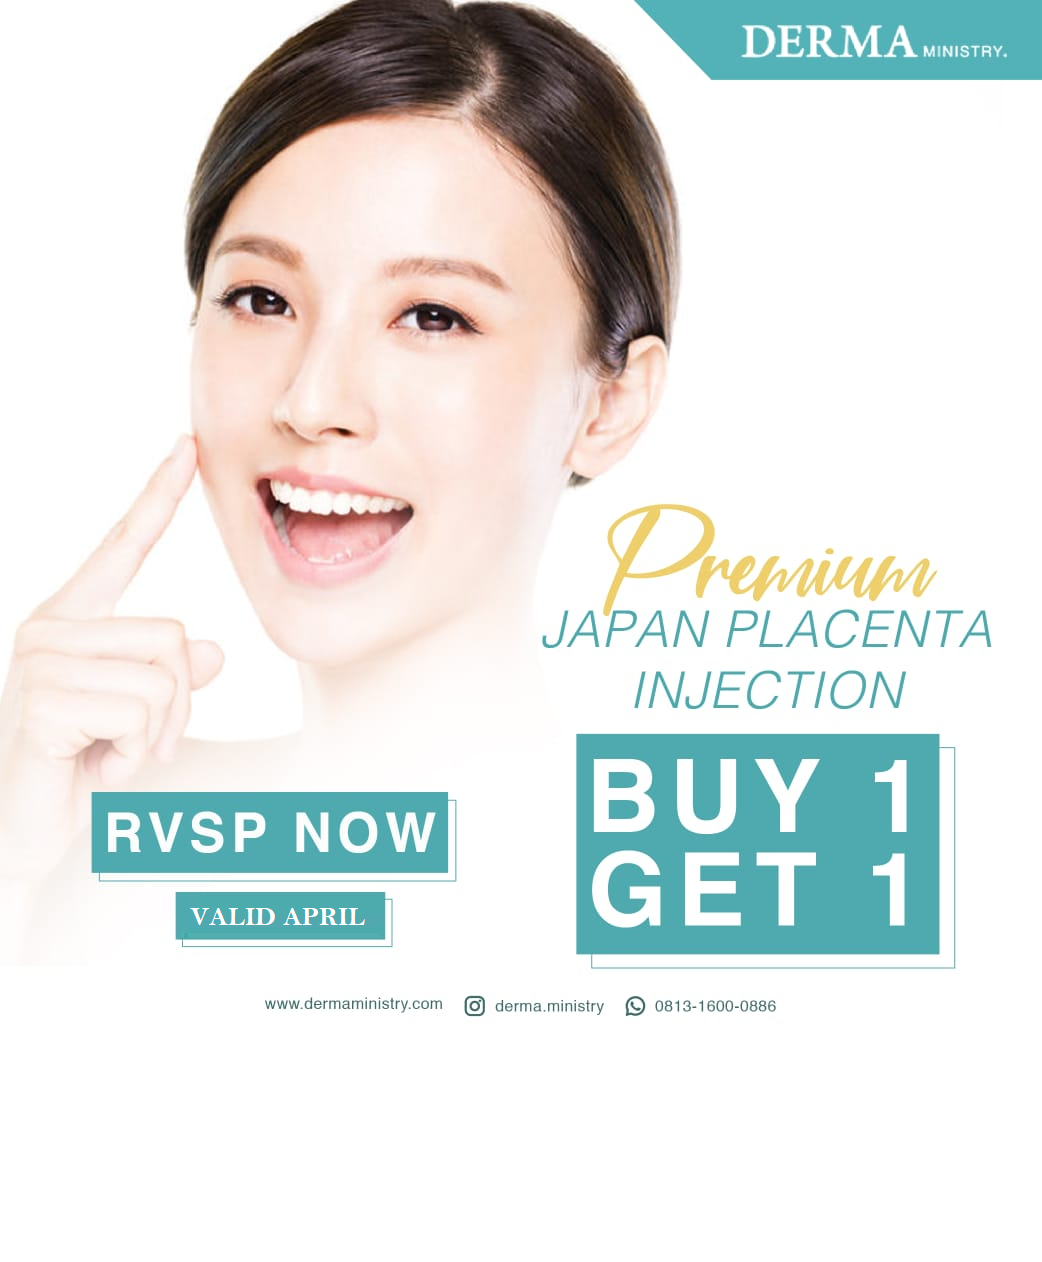 Buy 1 Get 1 Japan Placenta Injection